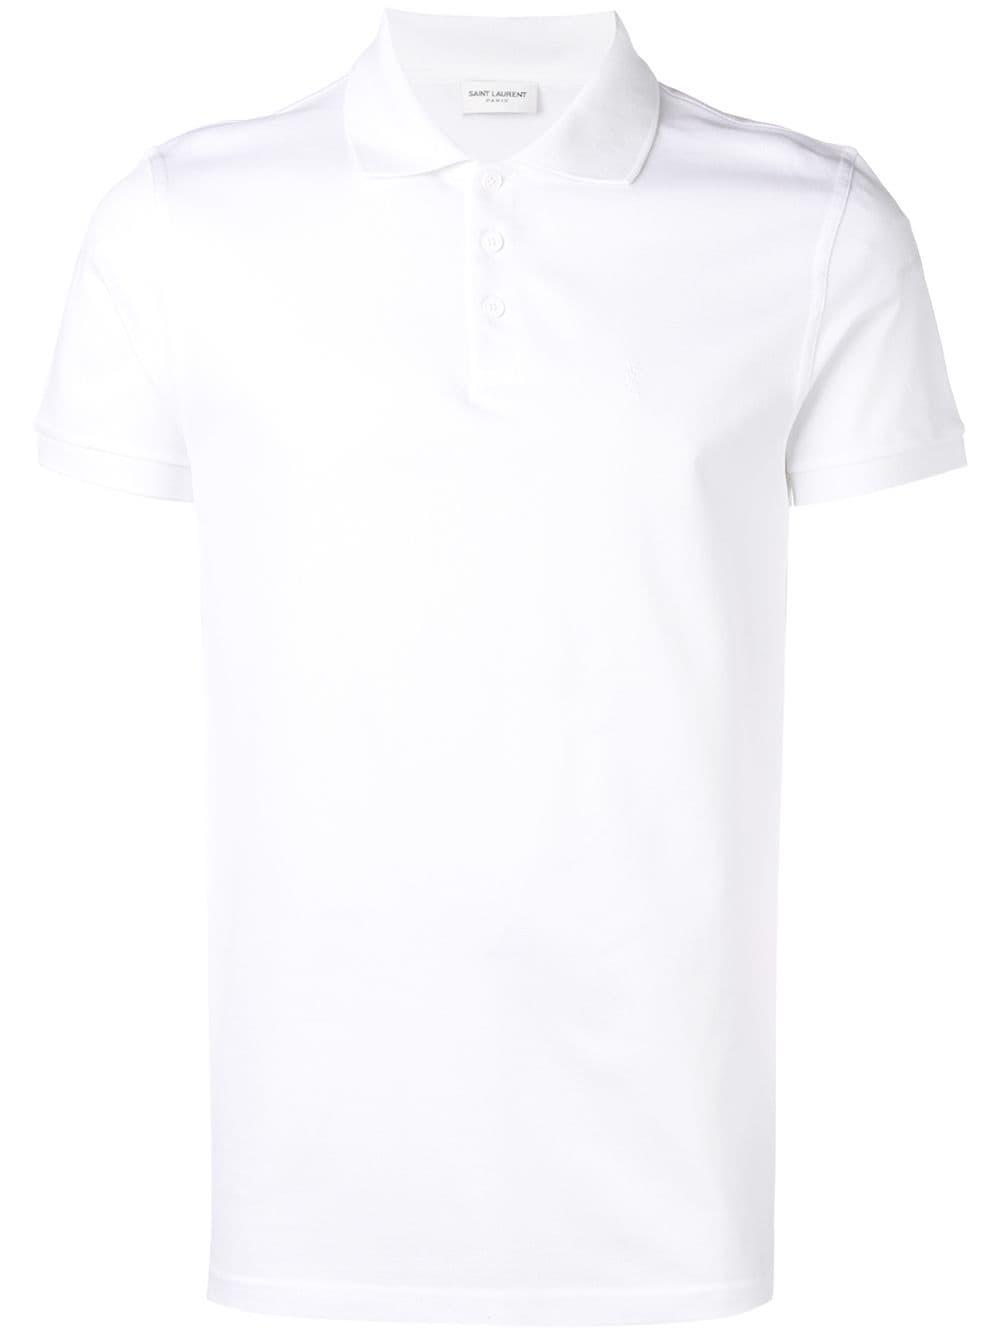 461c53bd95fa06 Polo Shirt in White Cotton - SAINT LAURENT - Russocapri